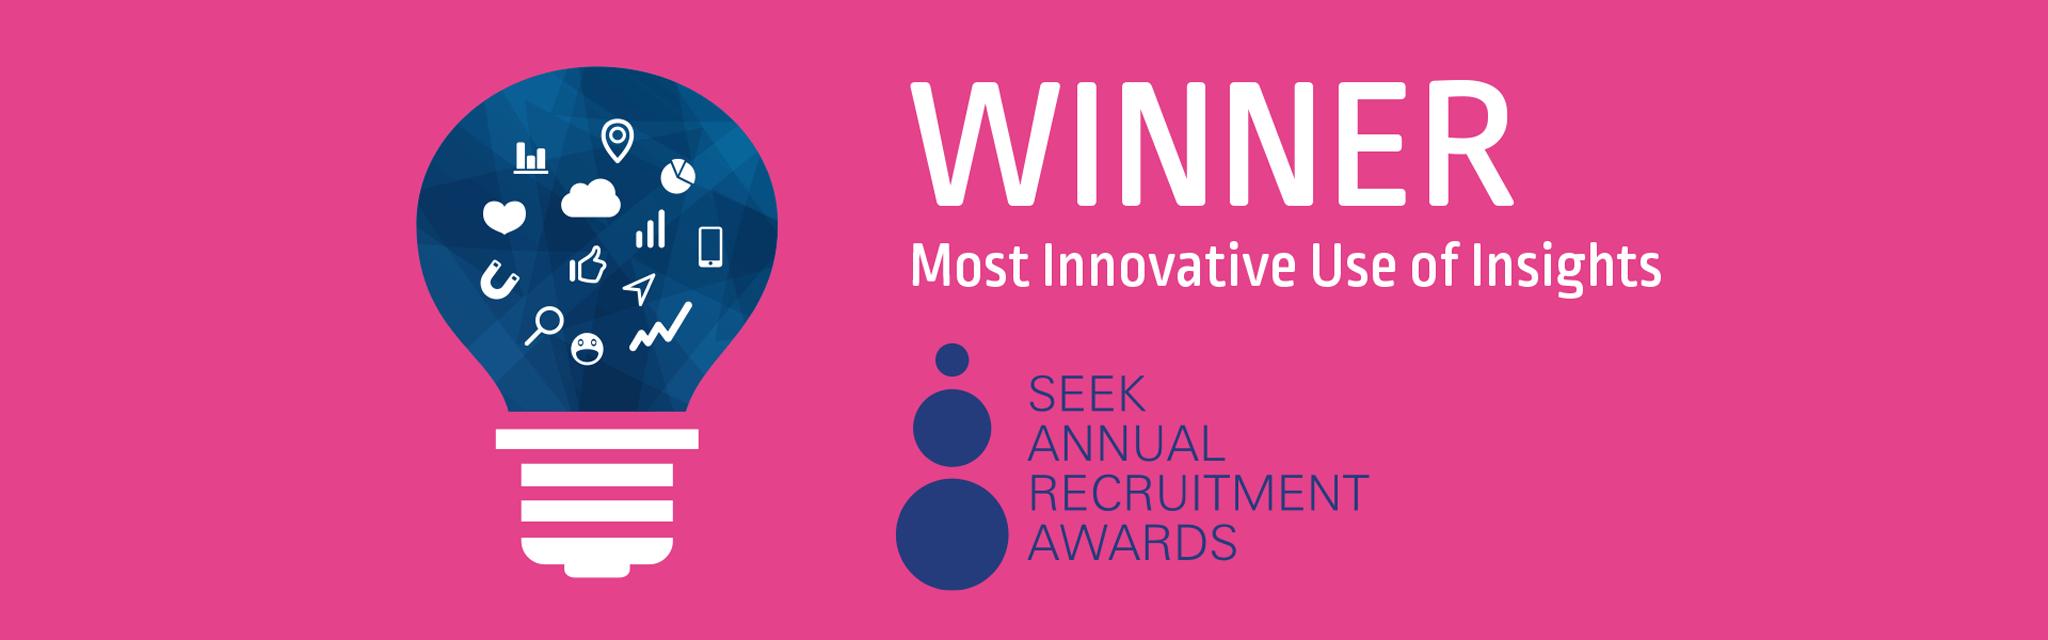 M&T Resources wins SEEK innovation award 2014